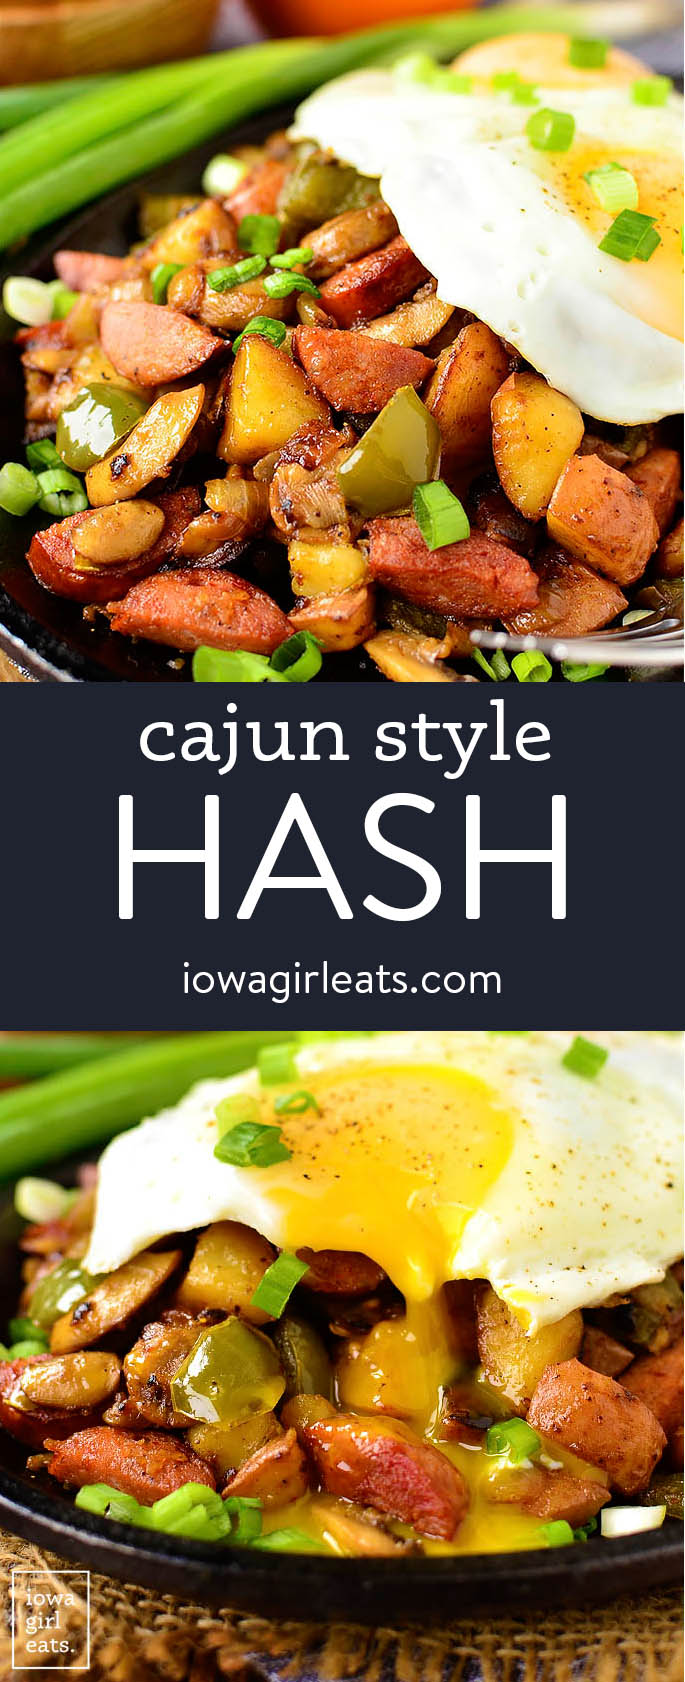 photo collage of cajun style hash